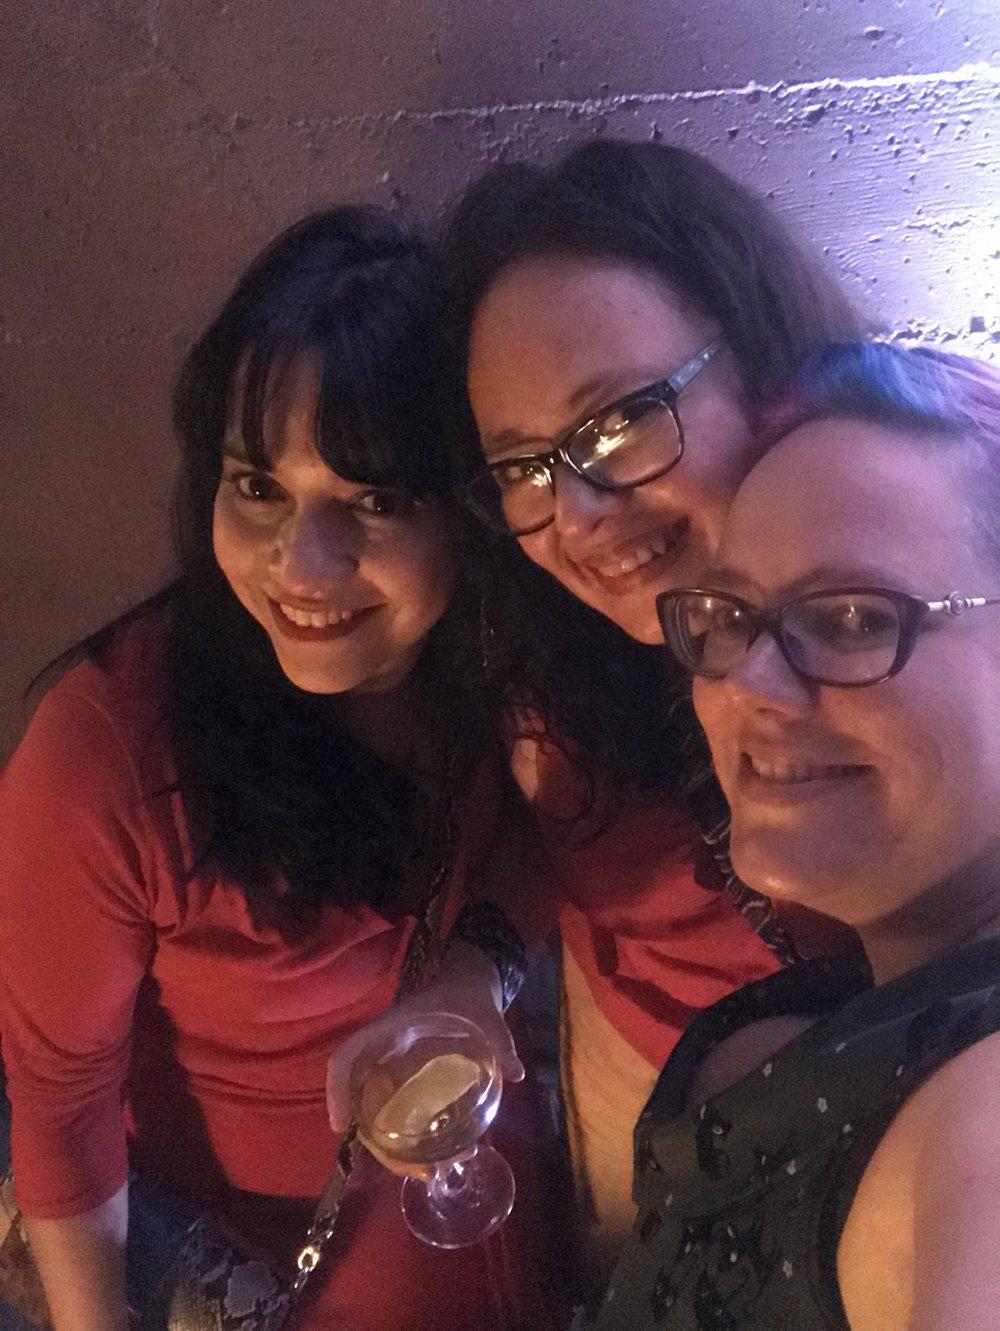 Gabriela Damián, Libia Brenda, and Julia Rios